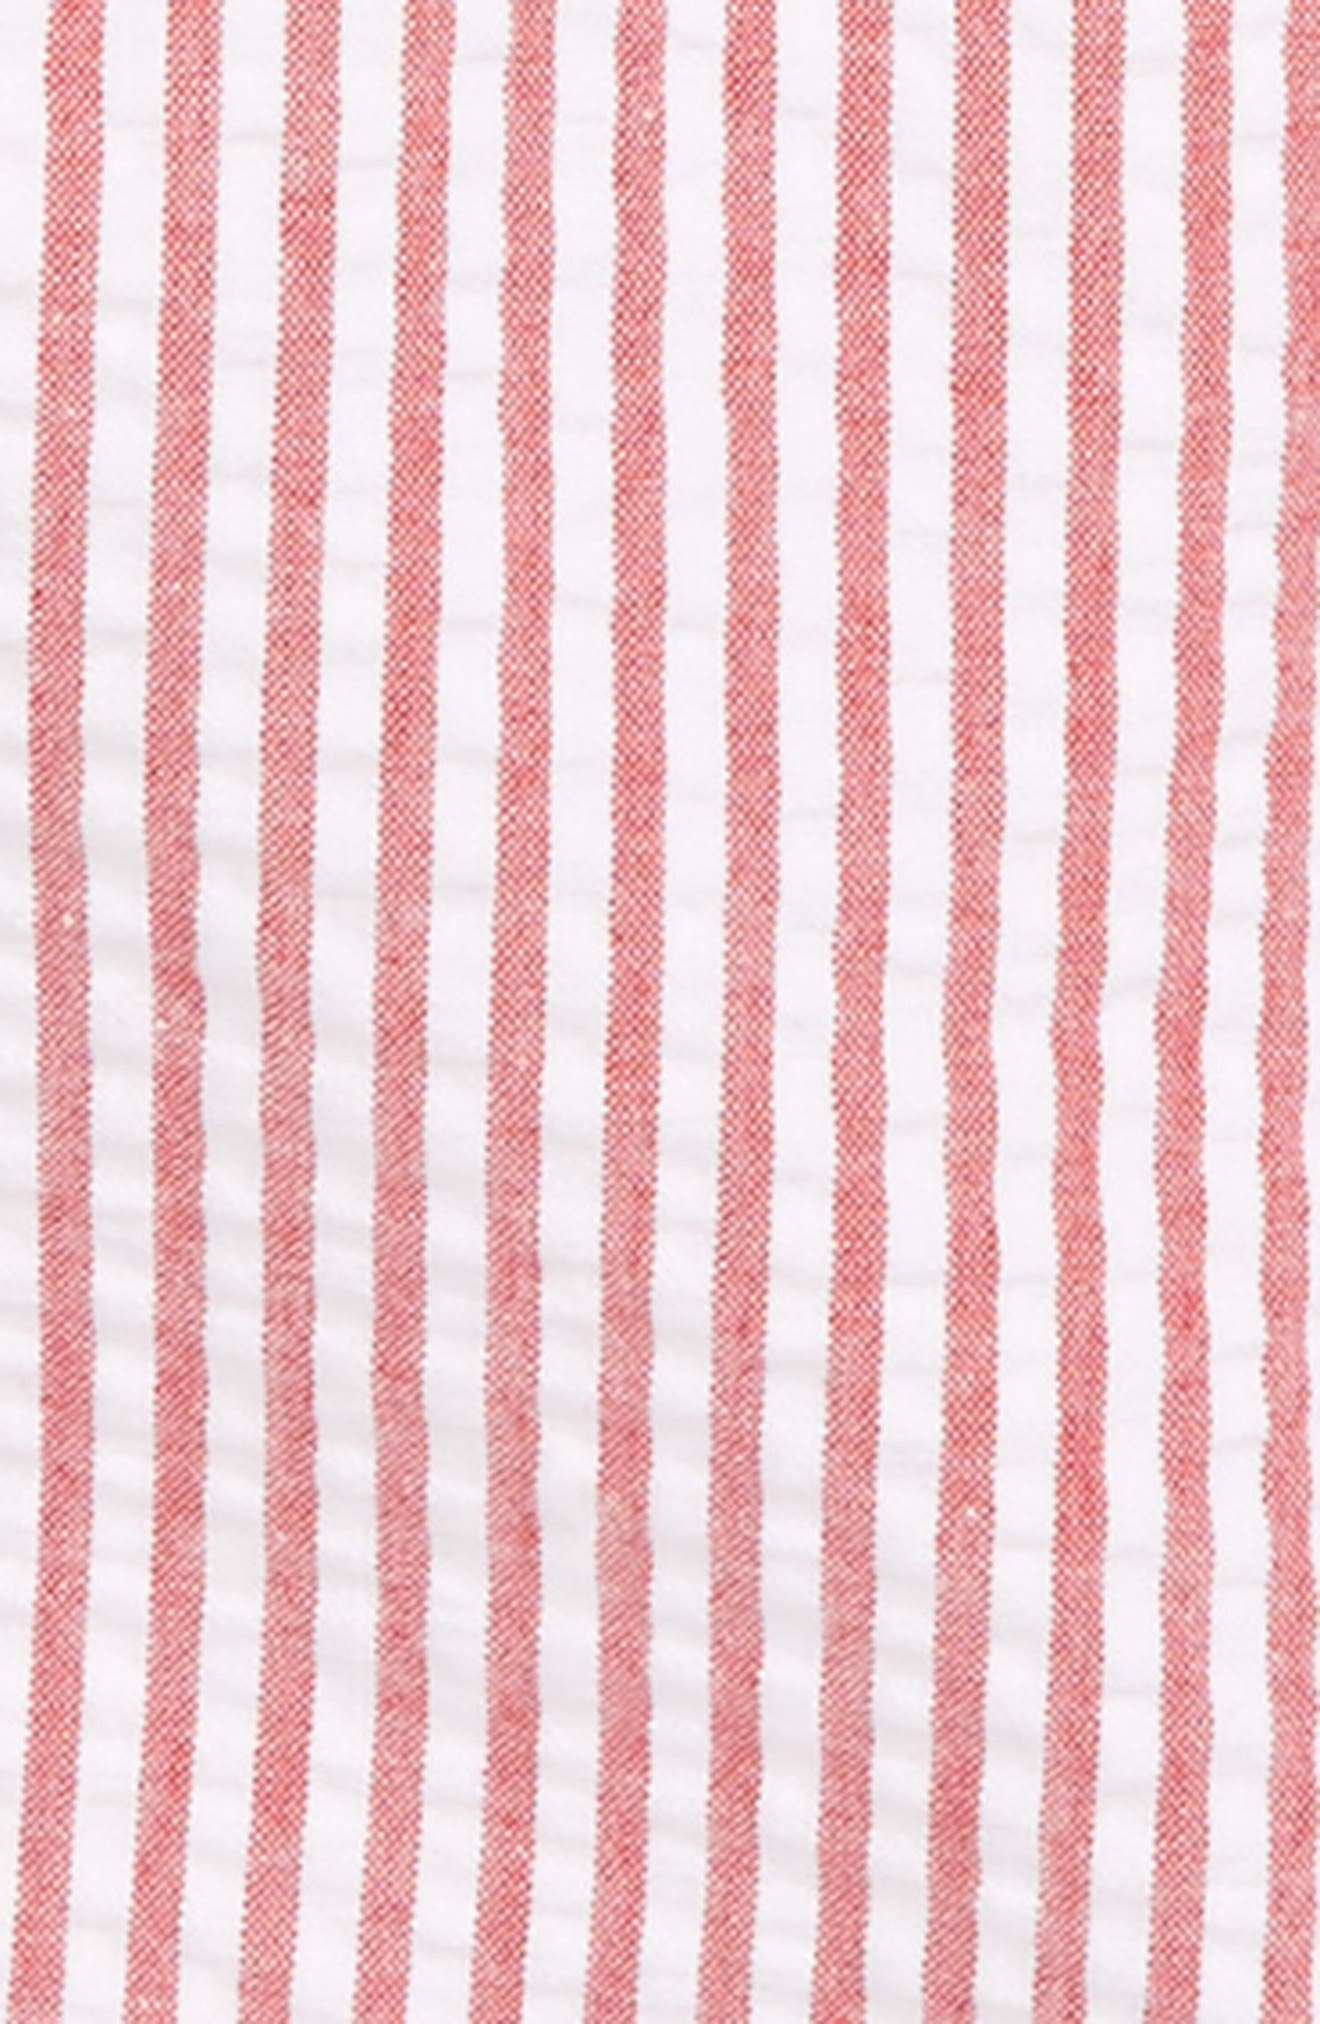 LITTLE ME Nautical Polo & Stripe Overall Shorts Set, Main, color, 648